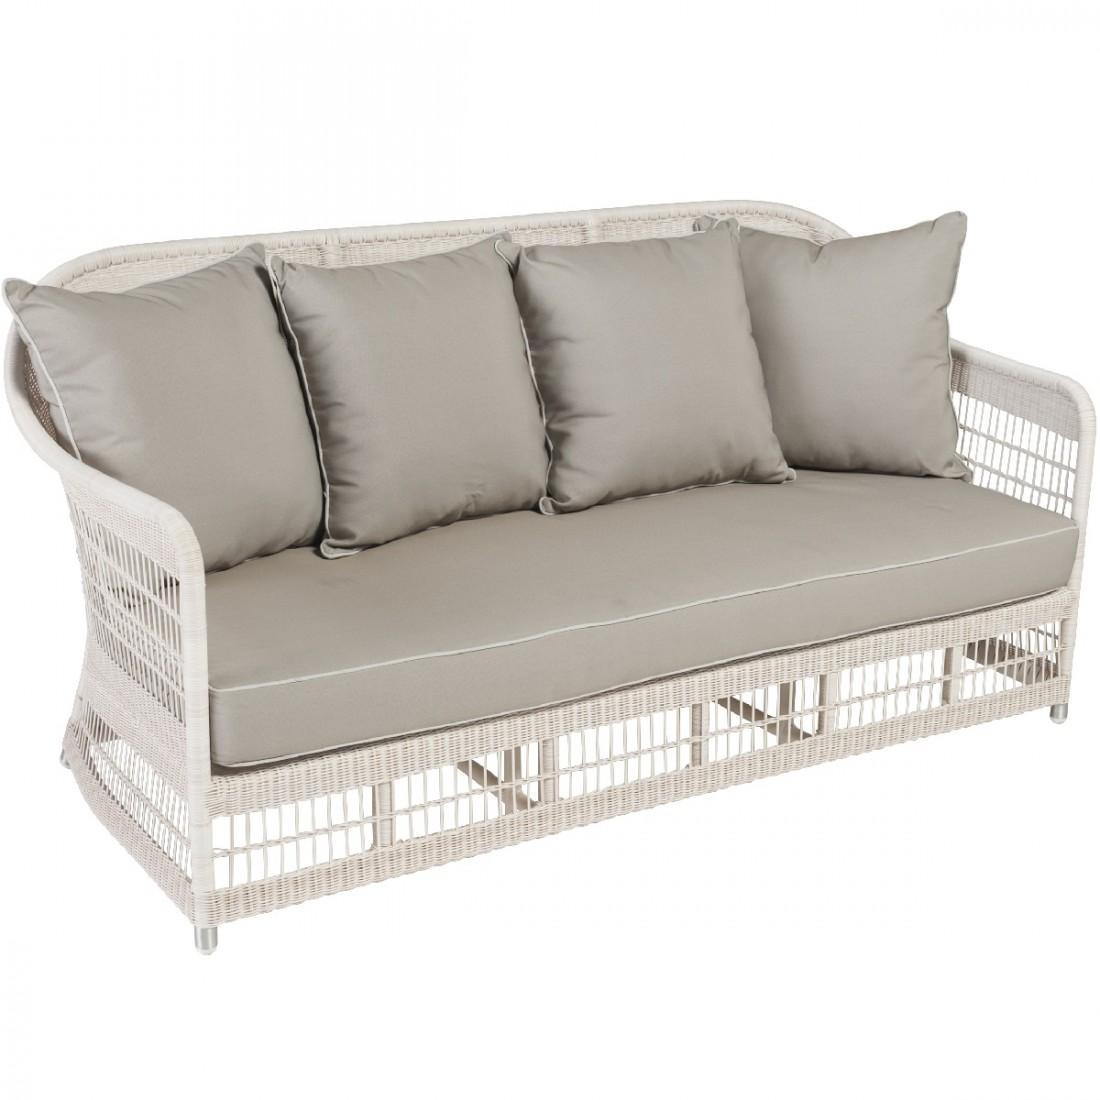 canap 3 places de jardin en r sine tress e biarritz. Black Bedroom Furniture Sets. Home Design Ideas